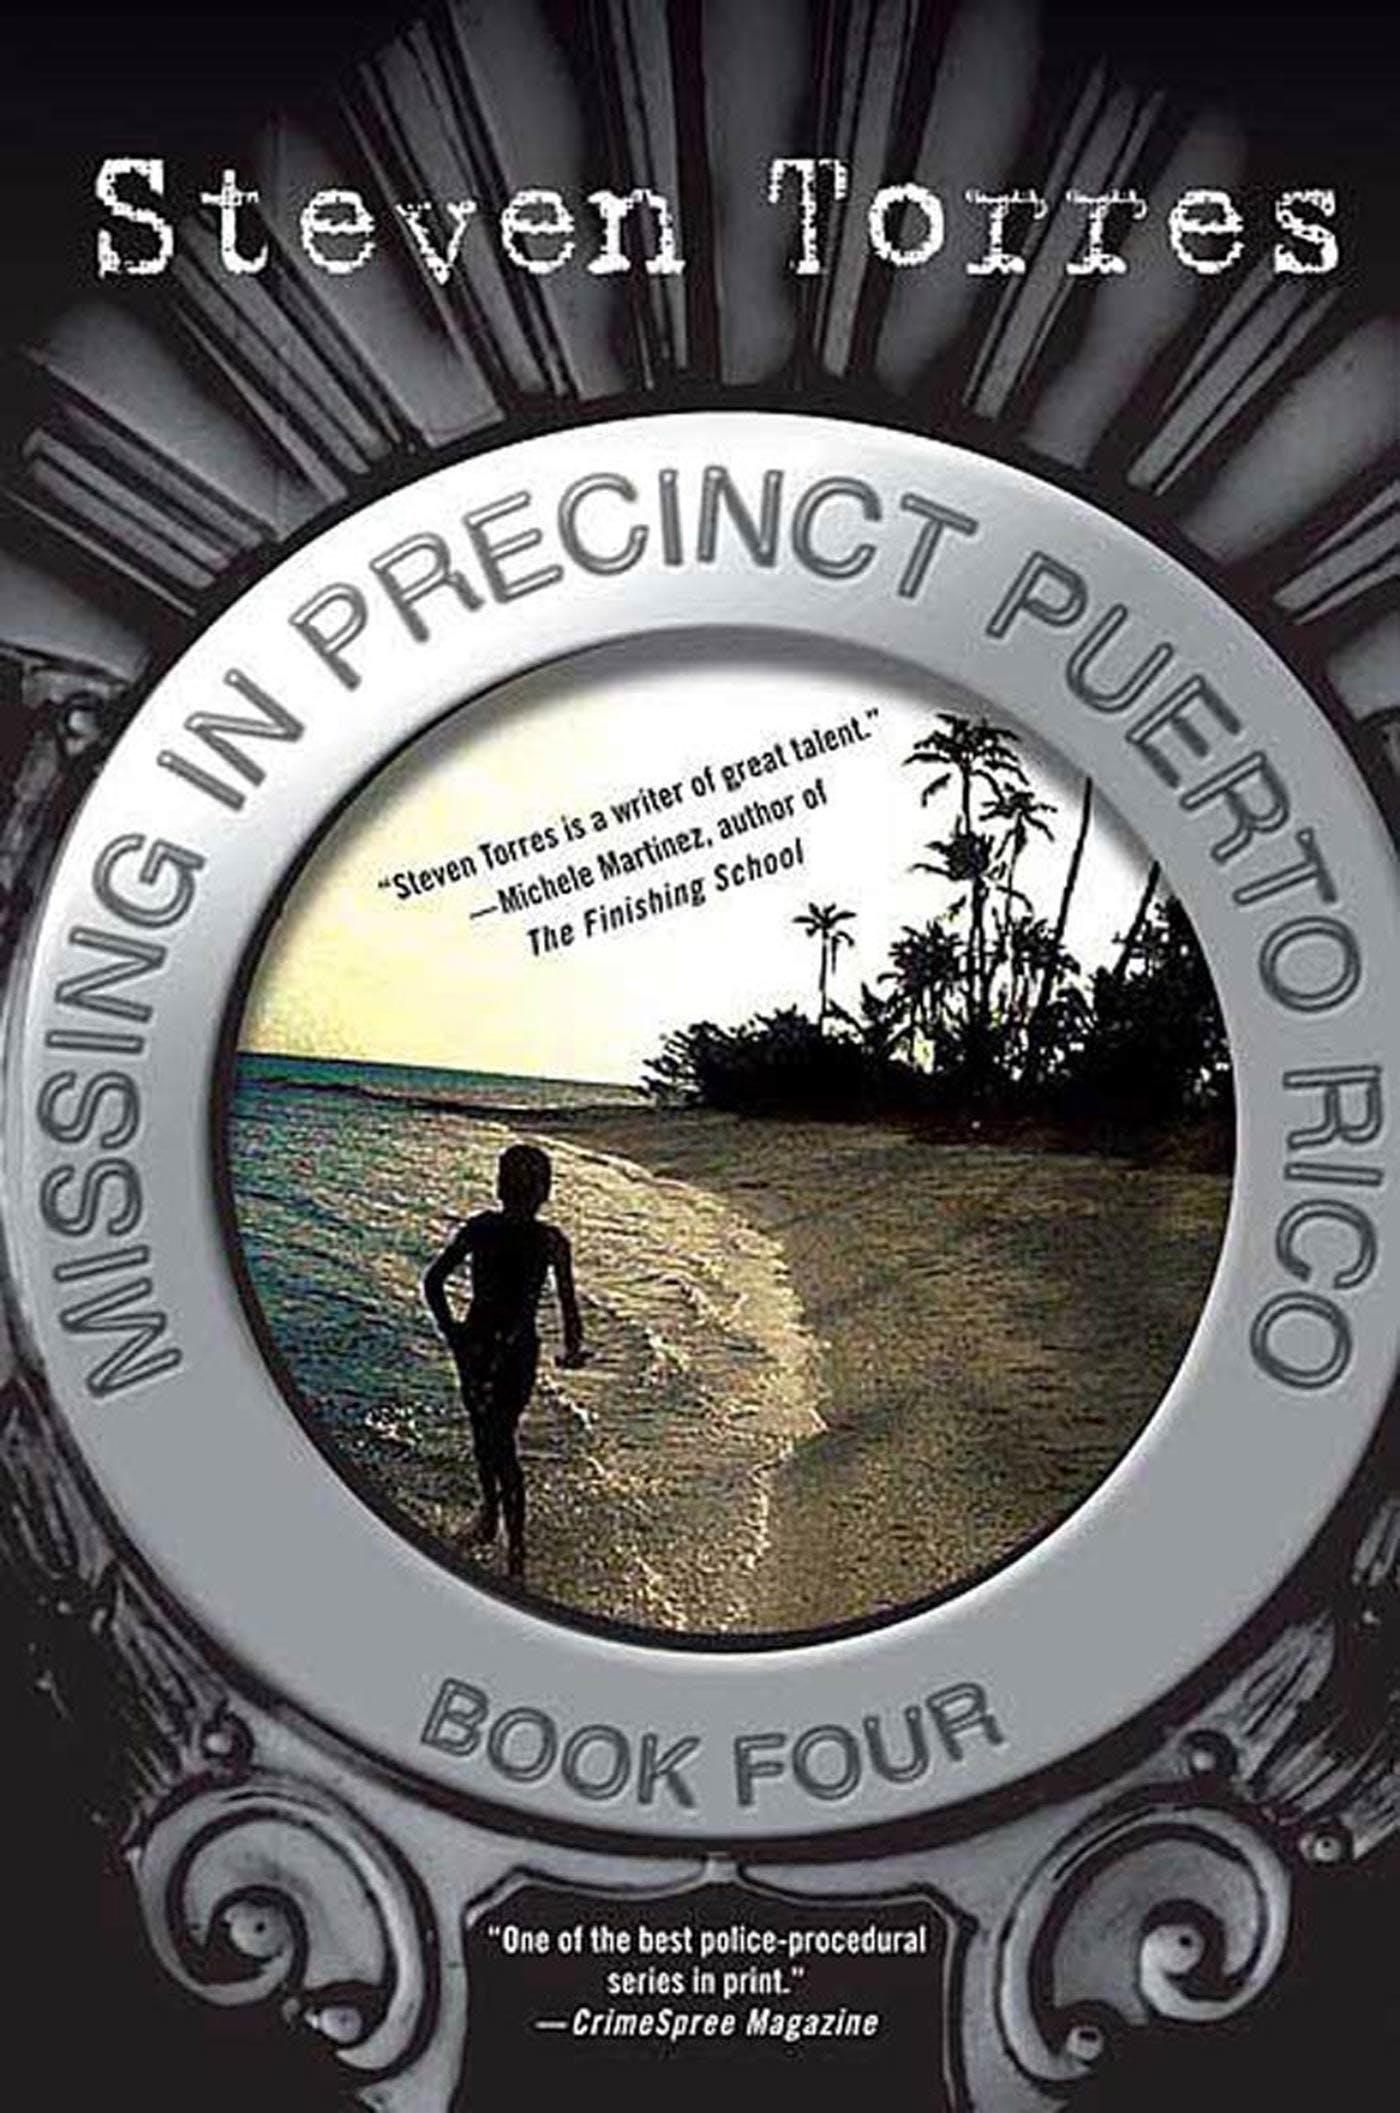 Image of Missing in Precinct Puerto Rico